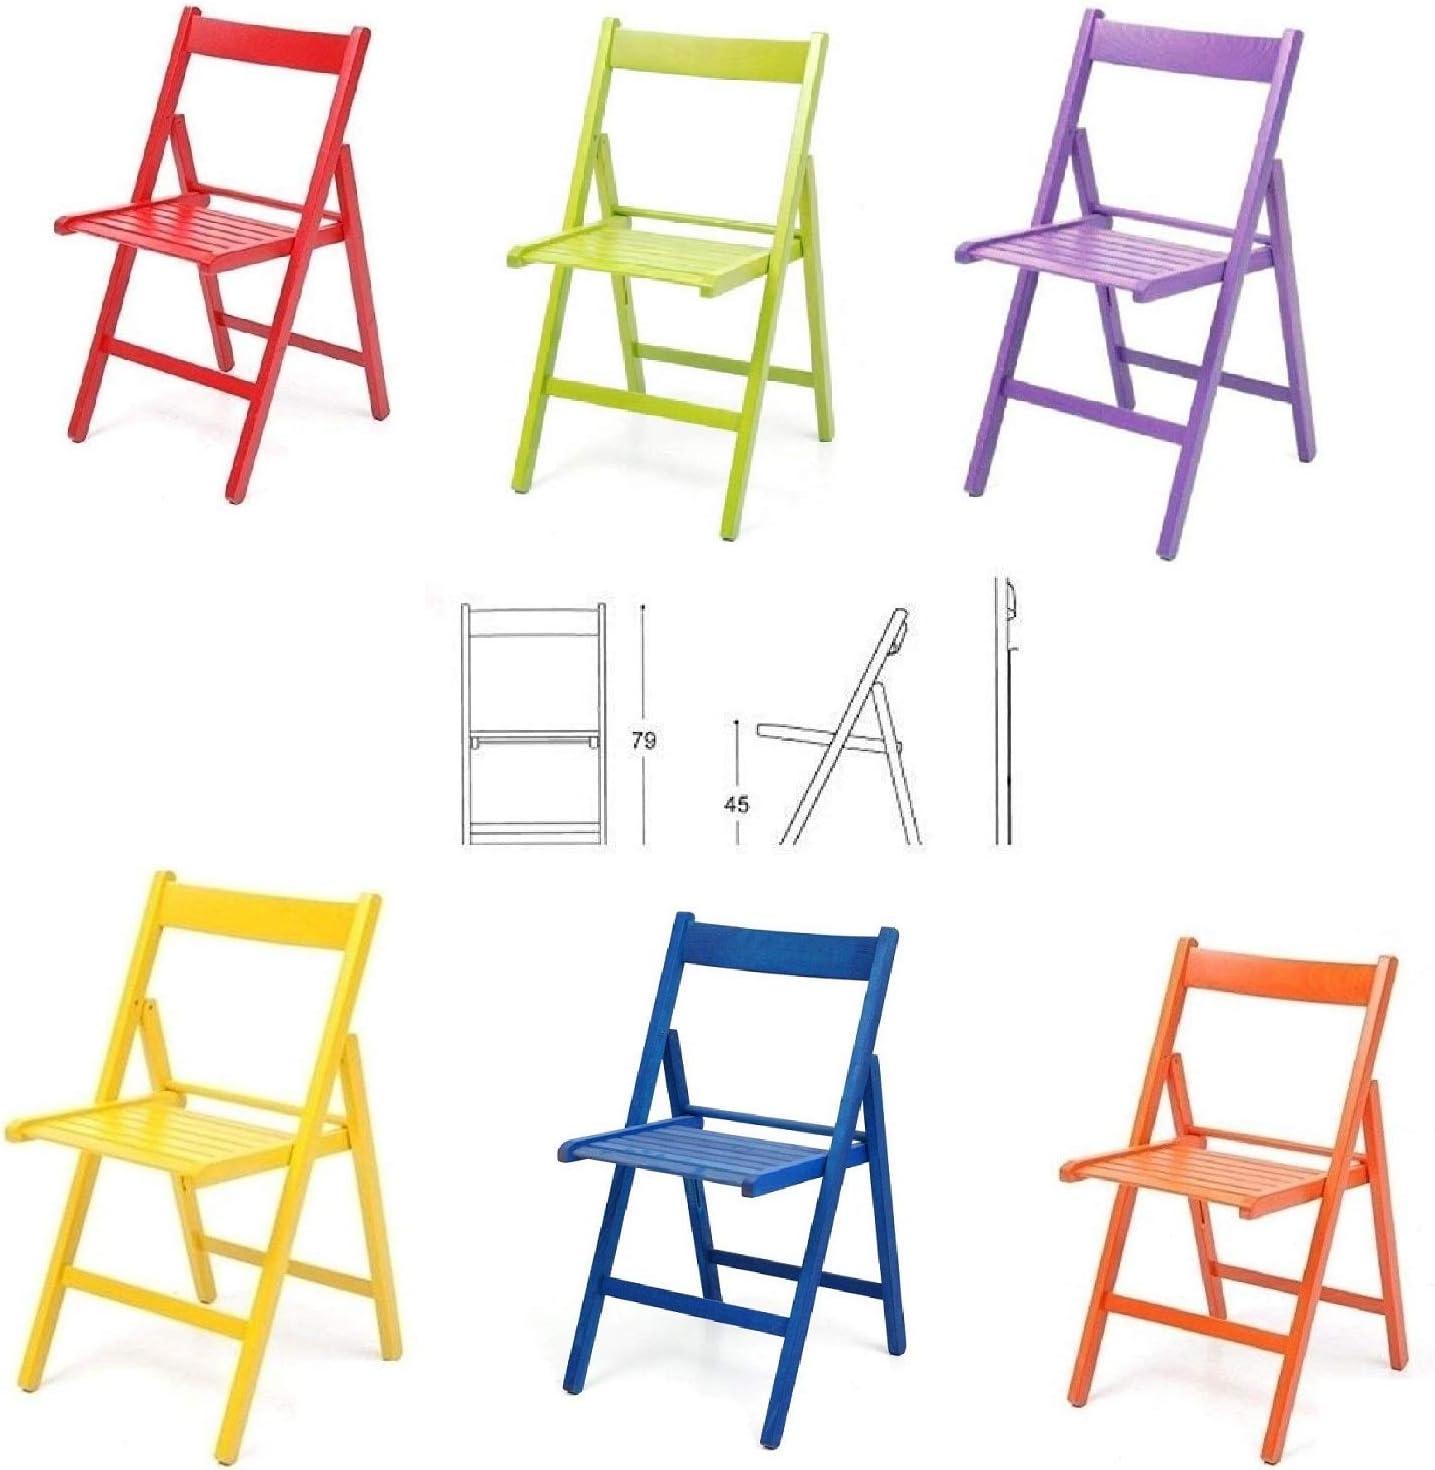 buiani 6 sillas de colores de madera barnizada, plegables ...